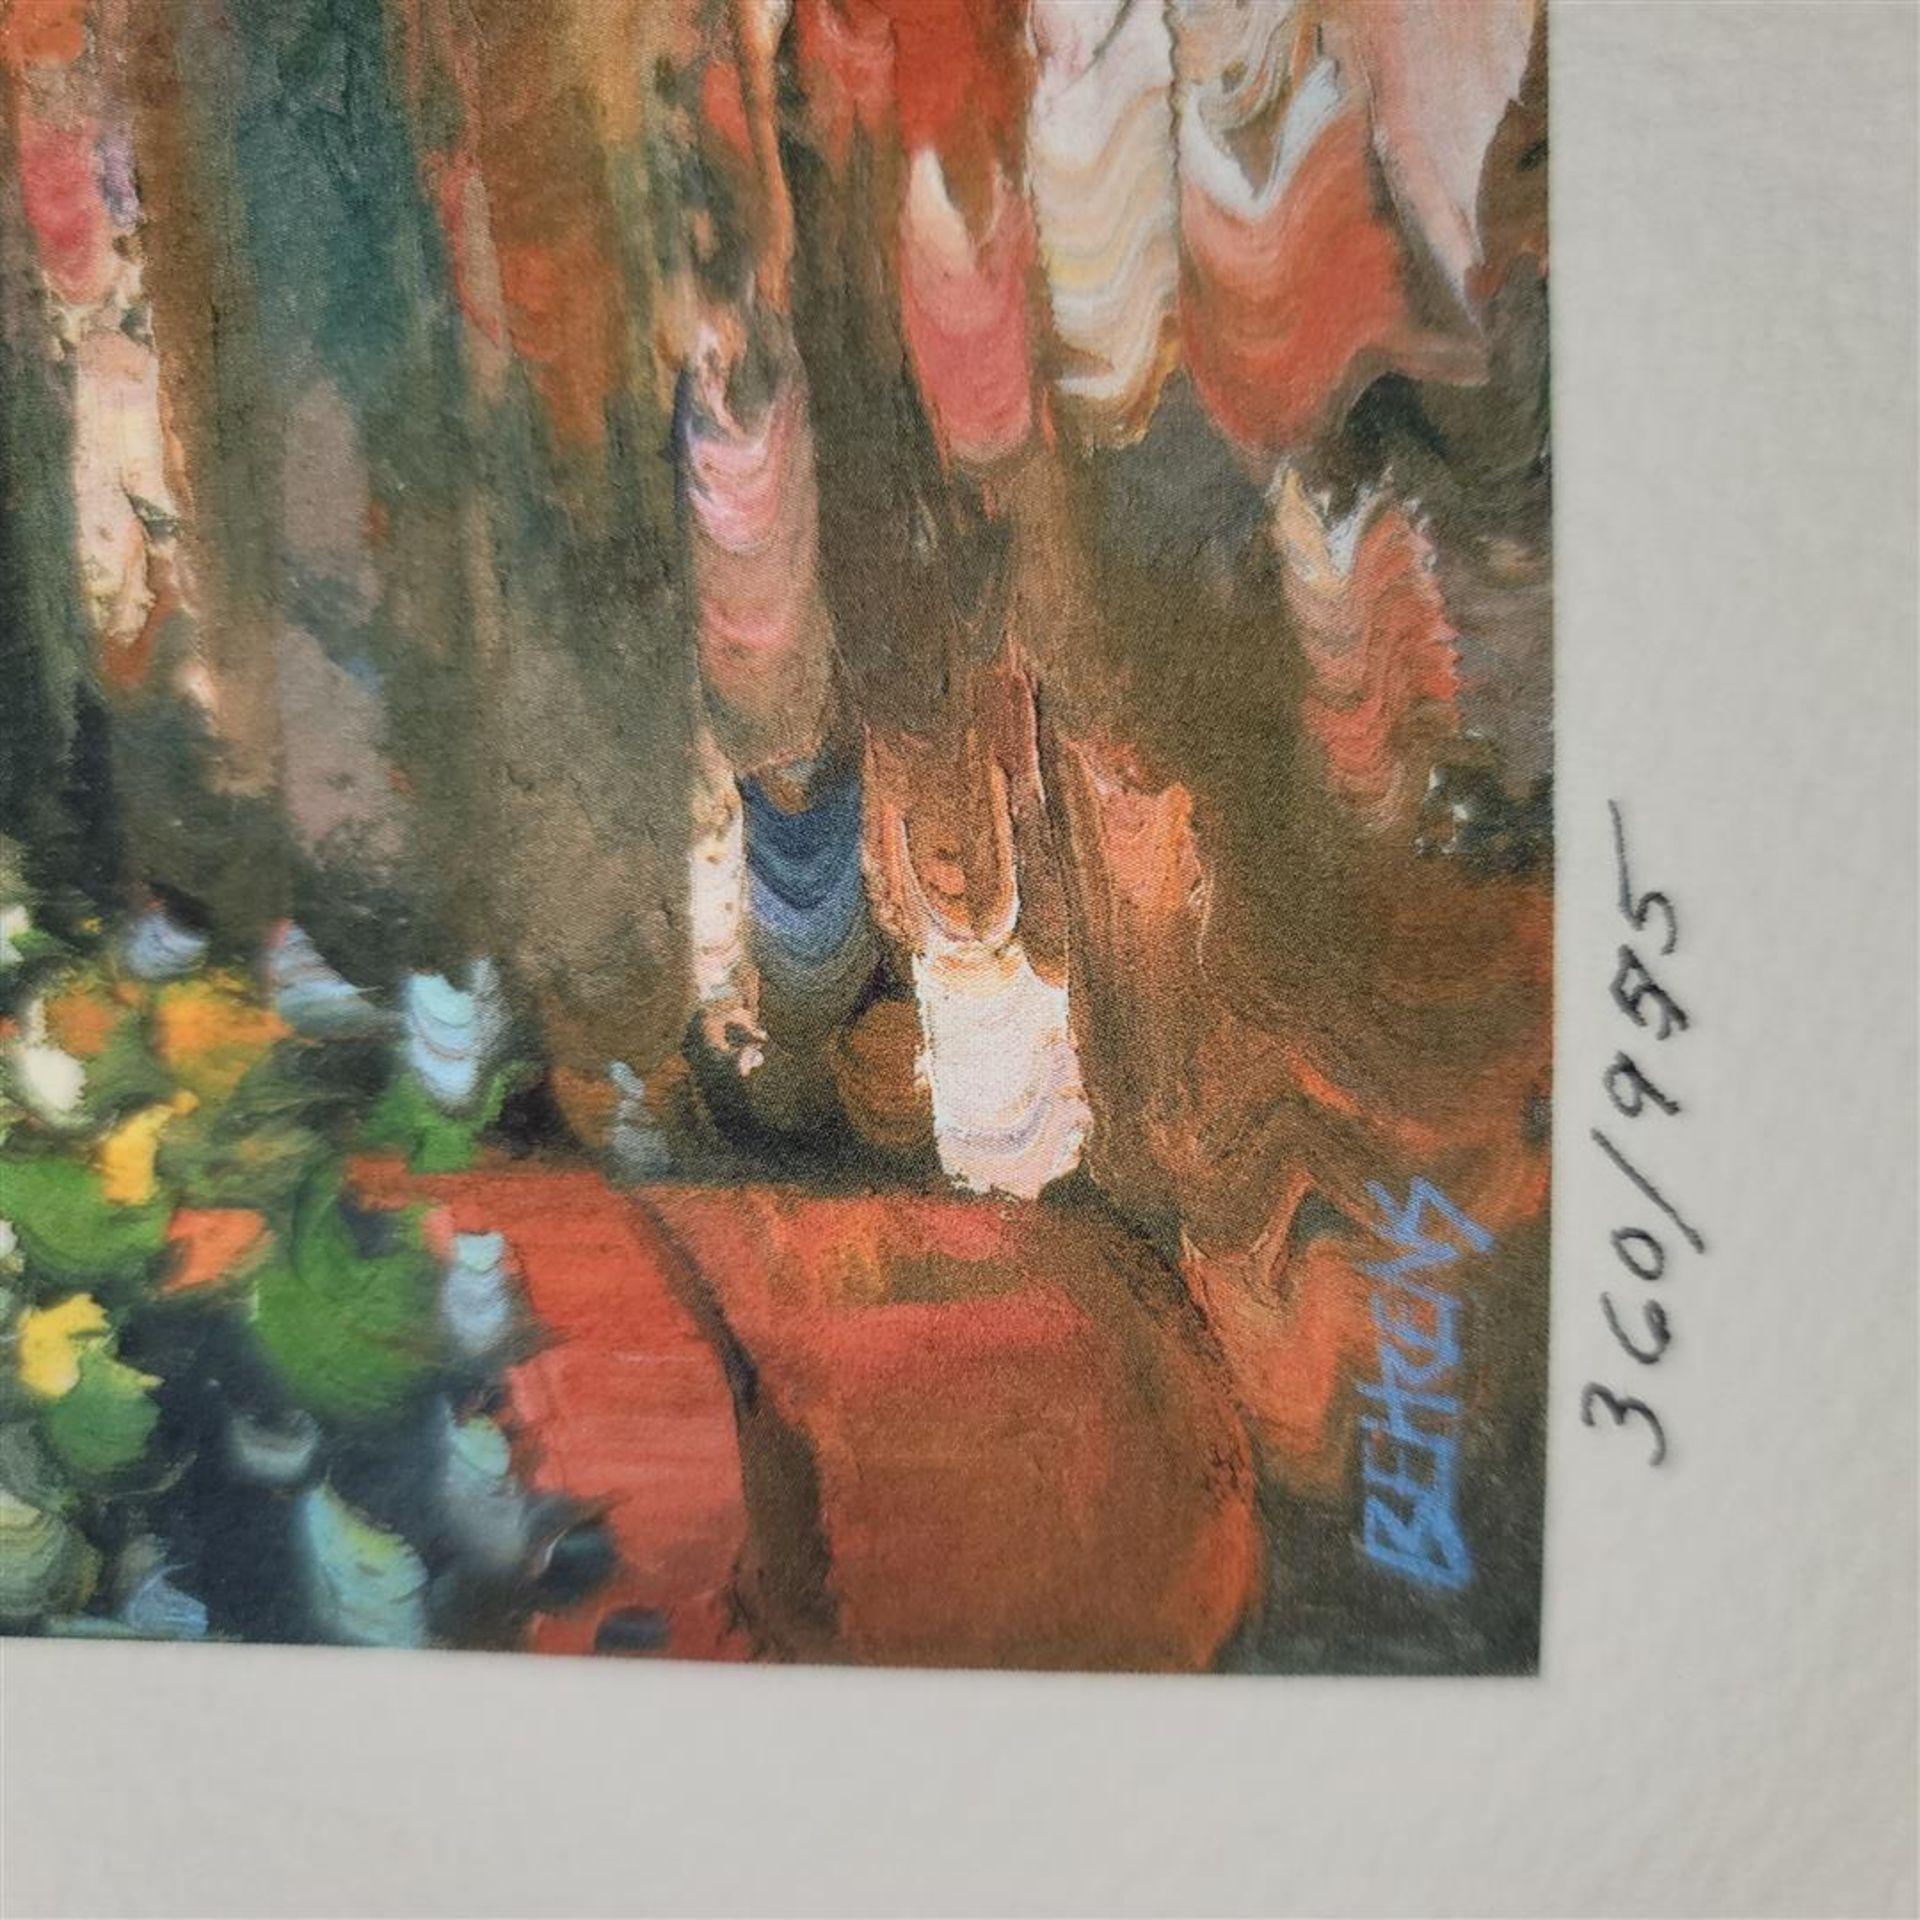 """Sunlit Stroll"" by Howard Behrens - Signed, Numbered, & Embellished - Image 3 of 4"